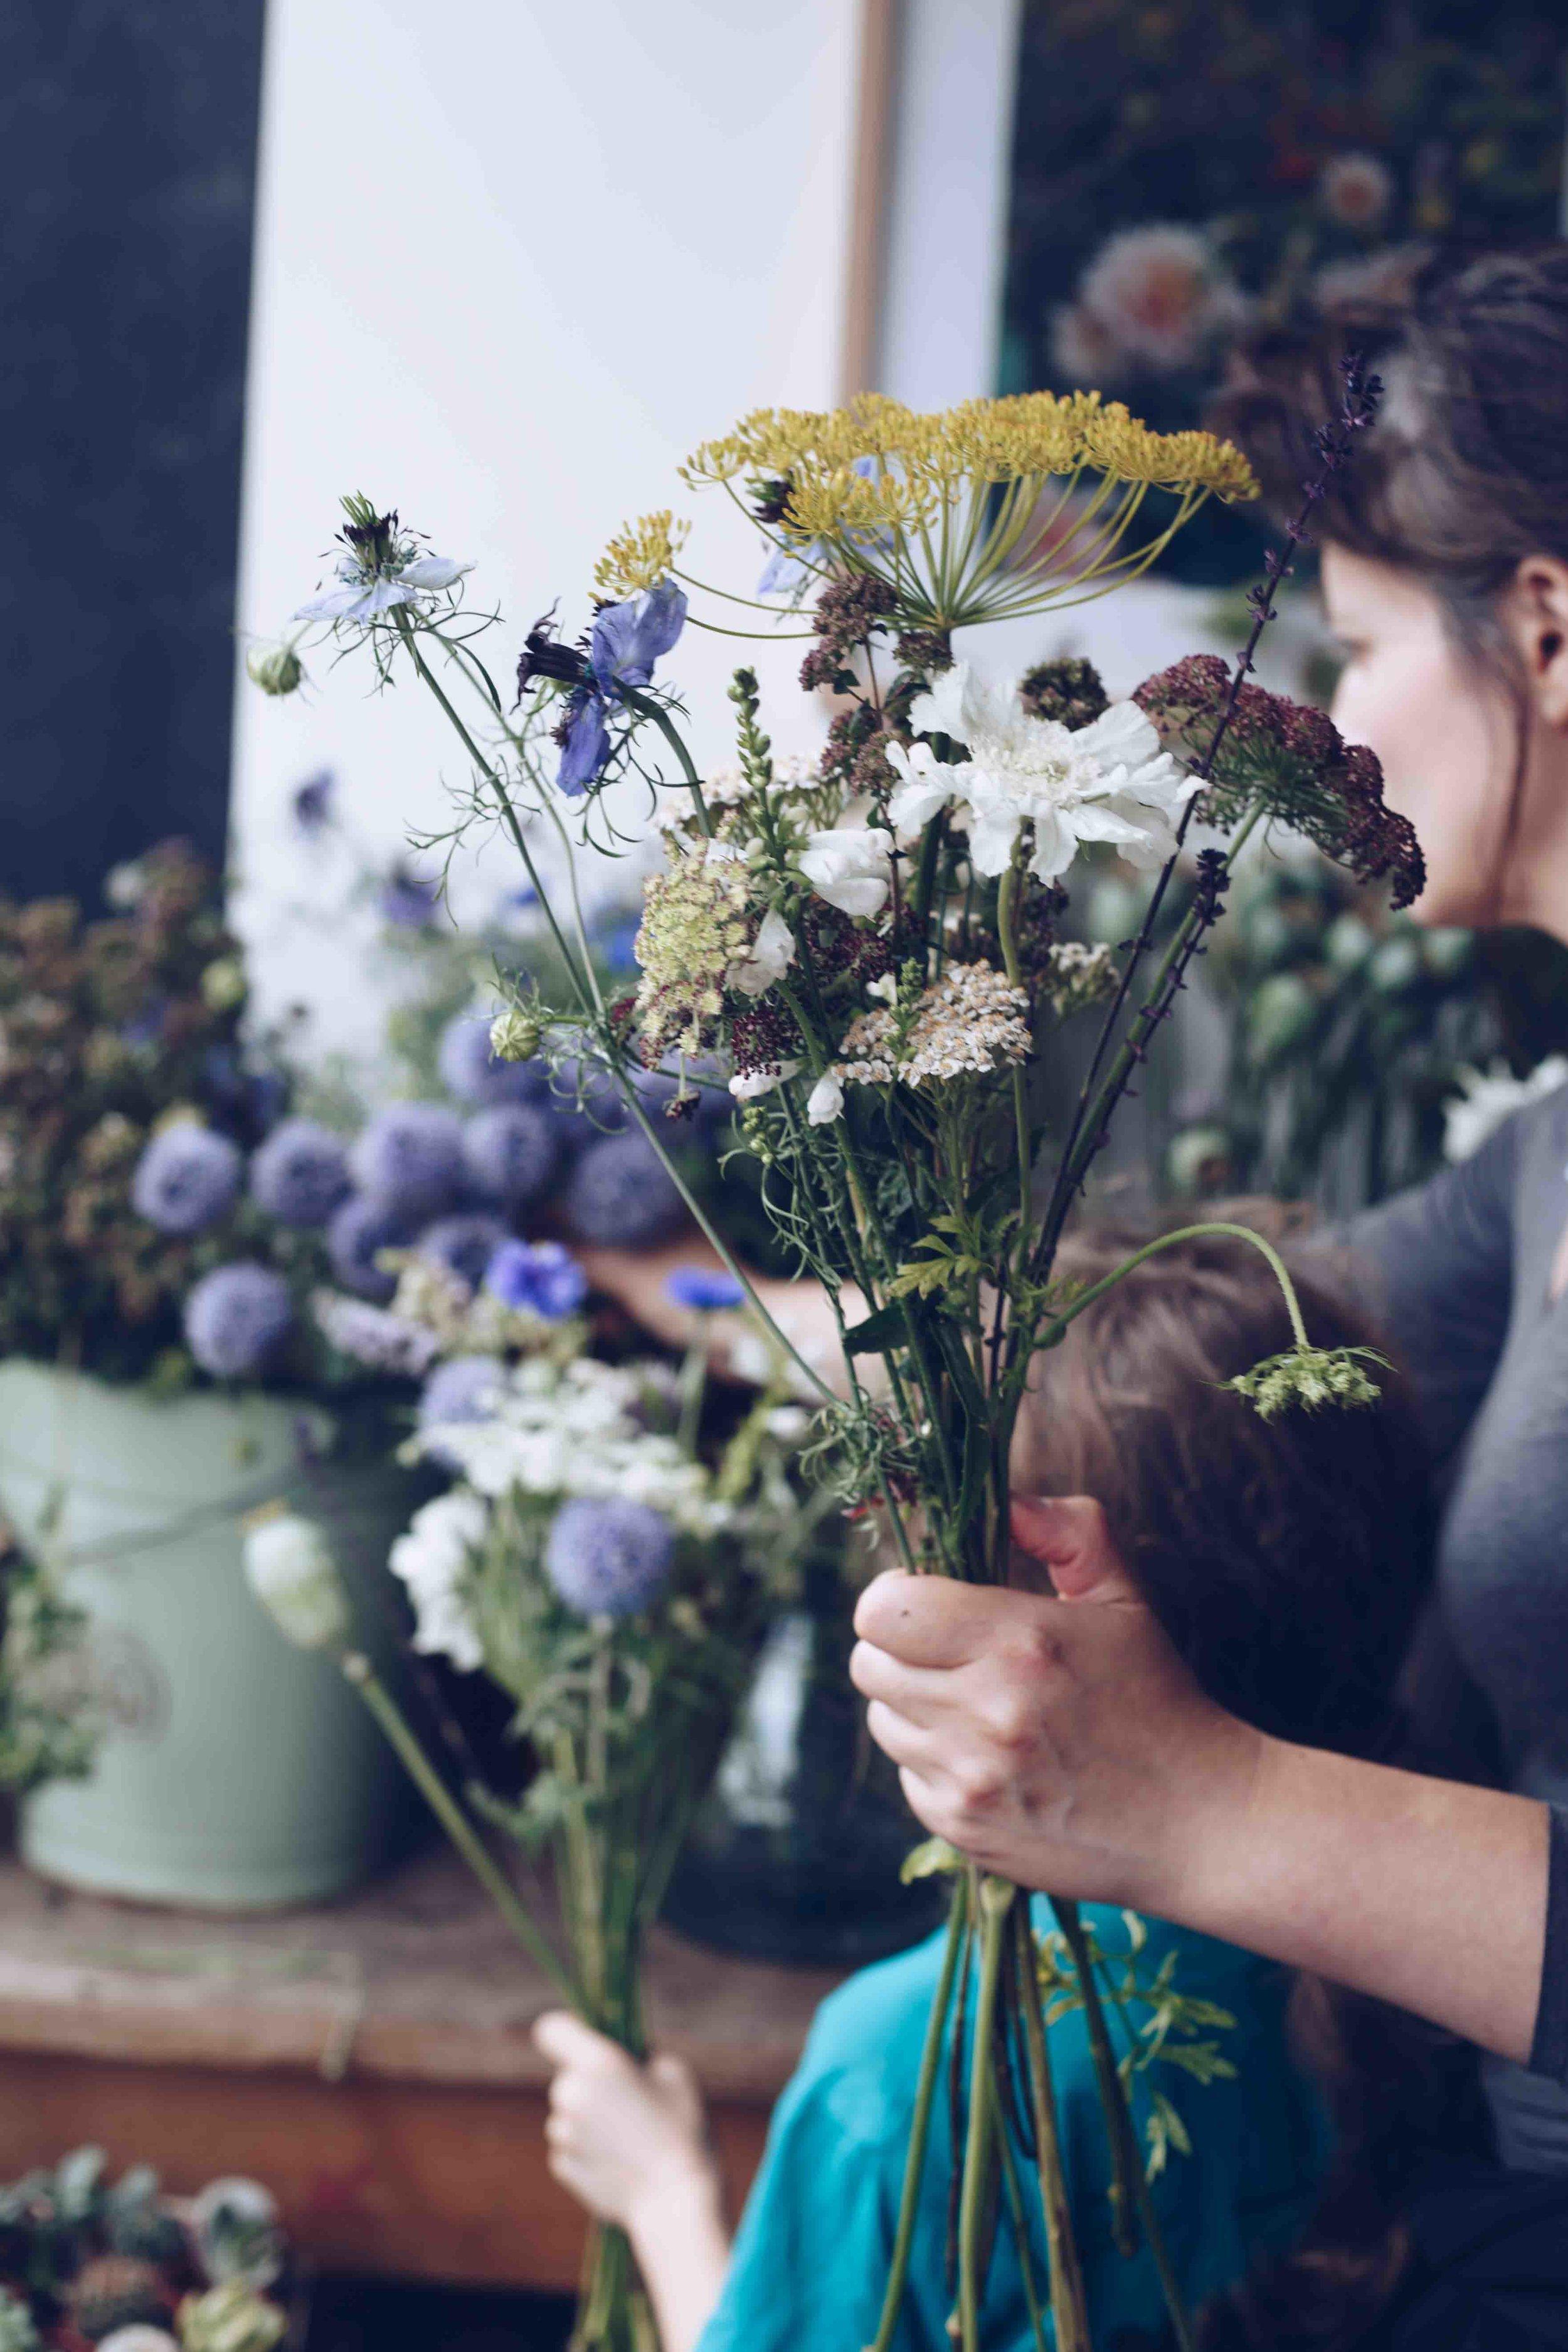 wildflower workshops at Botany / Photo:  Anna Jacobsen